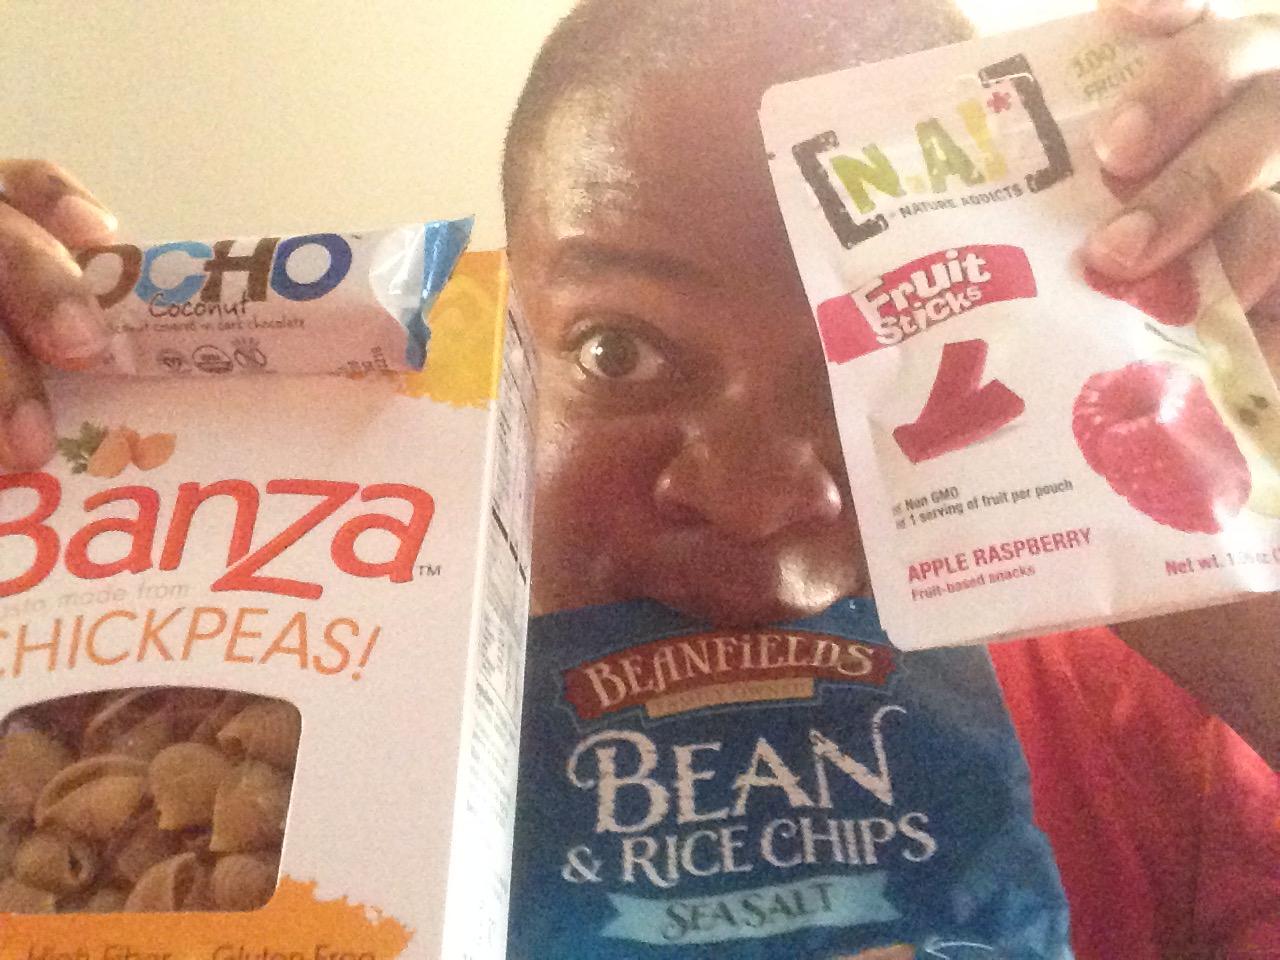 Producer D. sneak previewing Vegan Cuts' September Snack Box